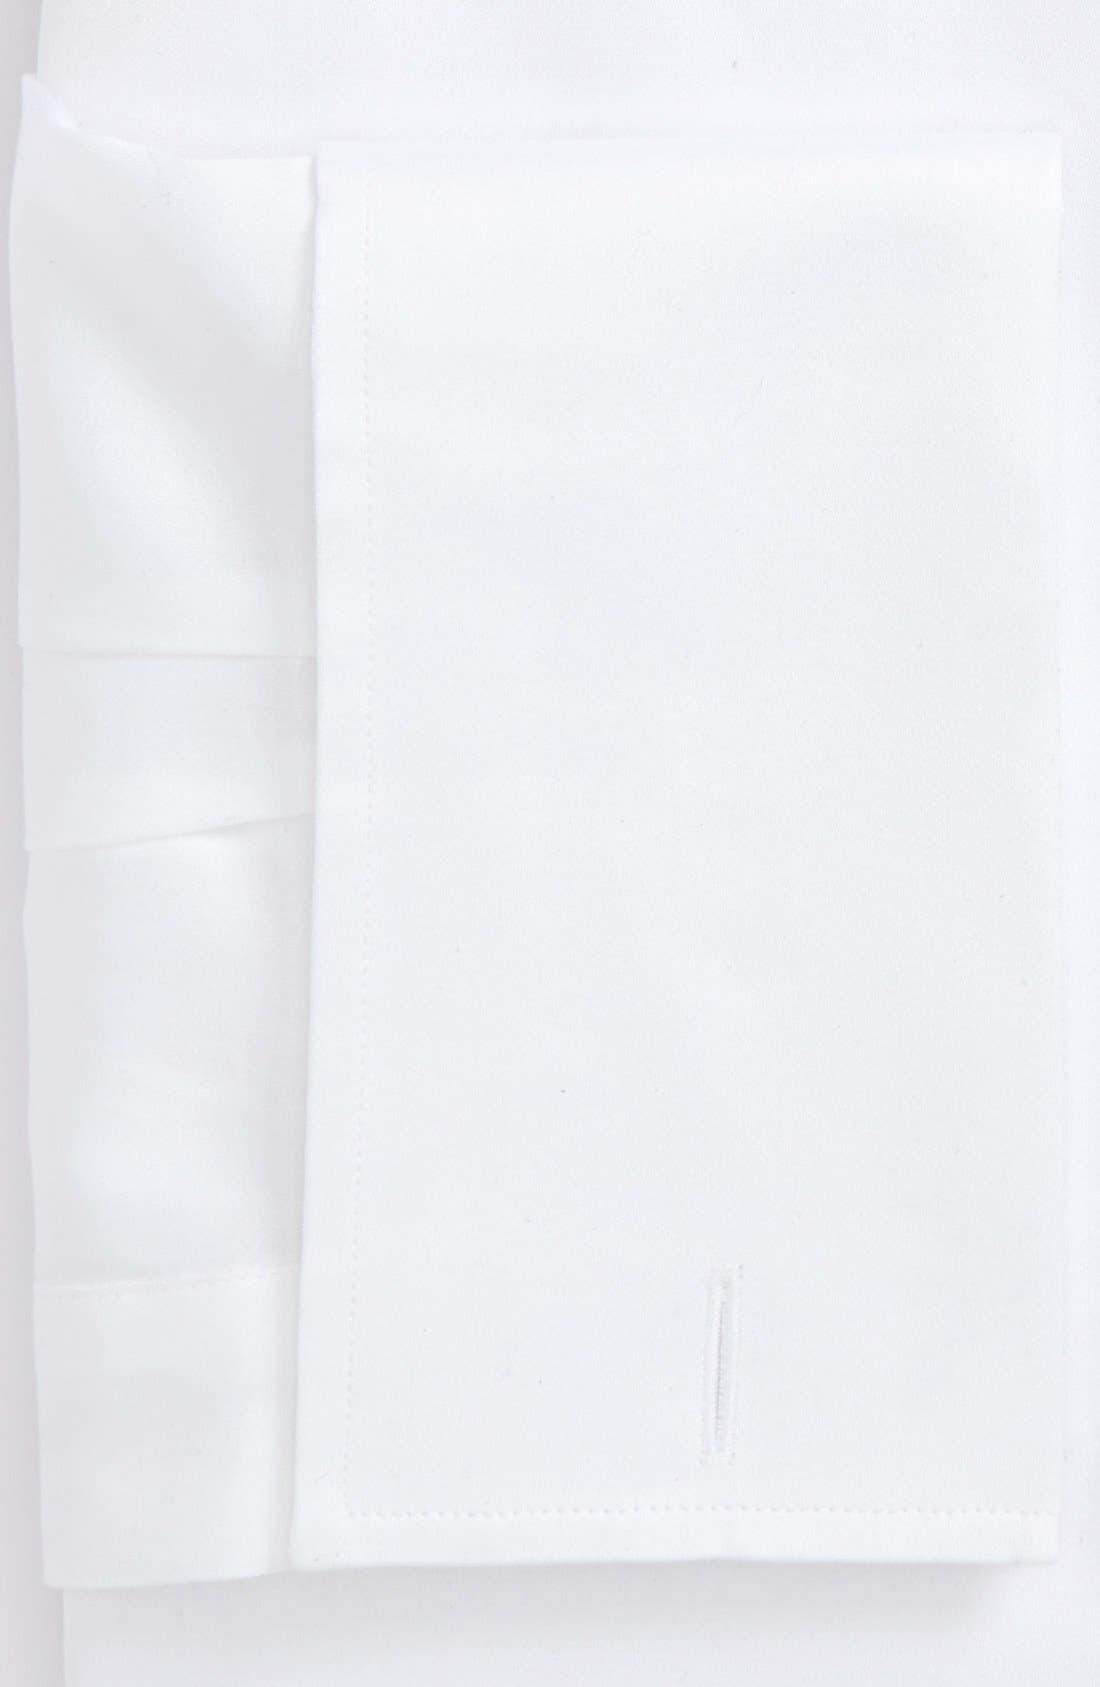 Alternate Image 2  - Ike Behar Regular Fit Solid French Cuff Dress Shirt (Online Only)